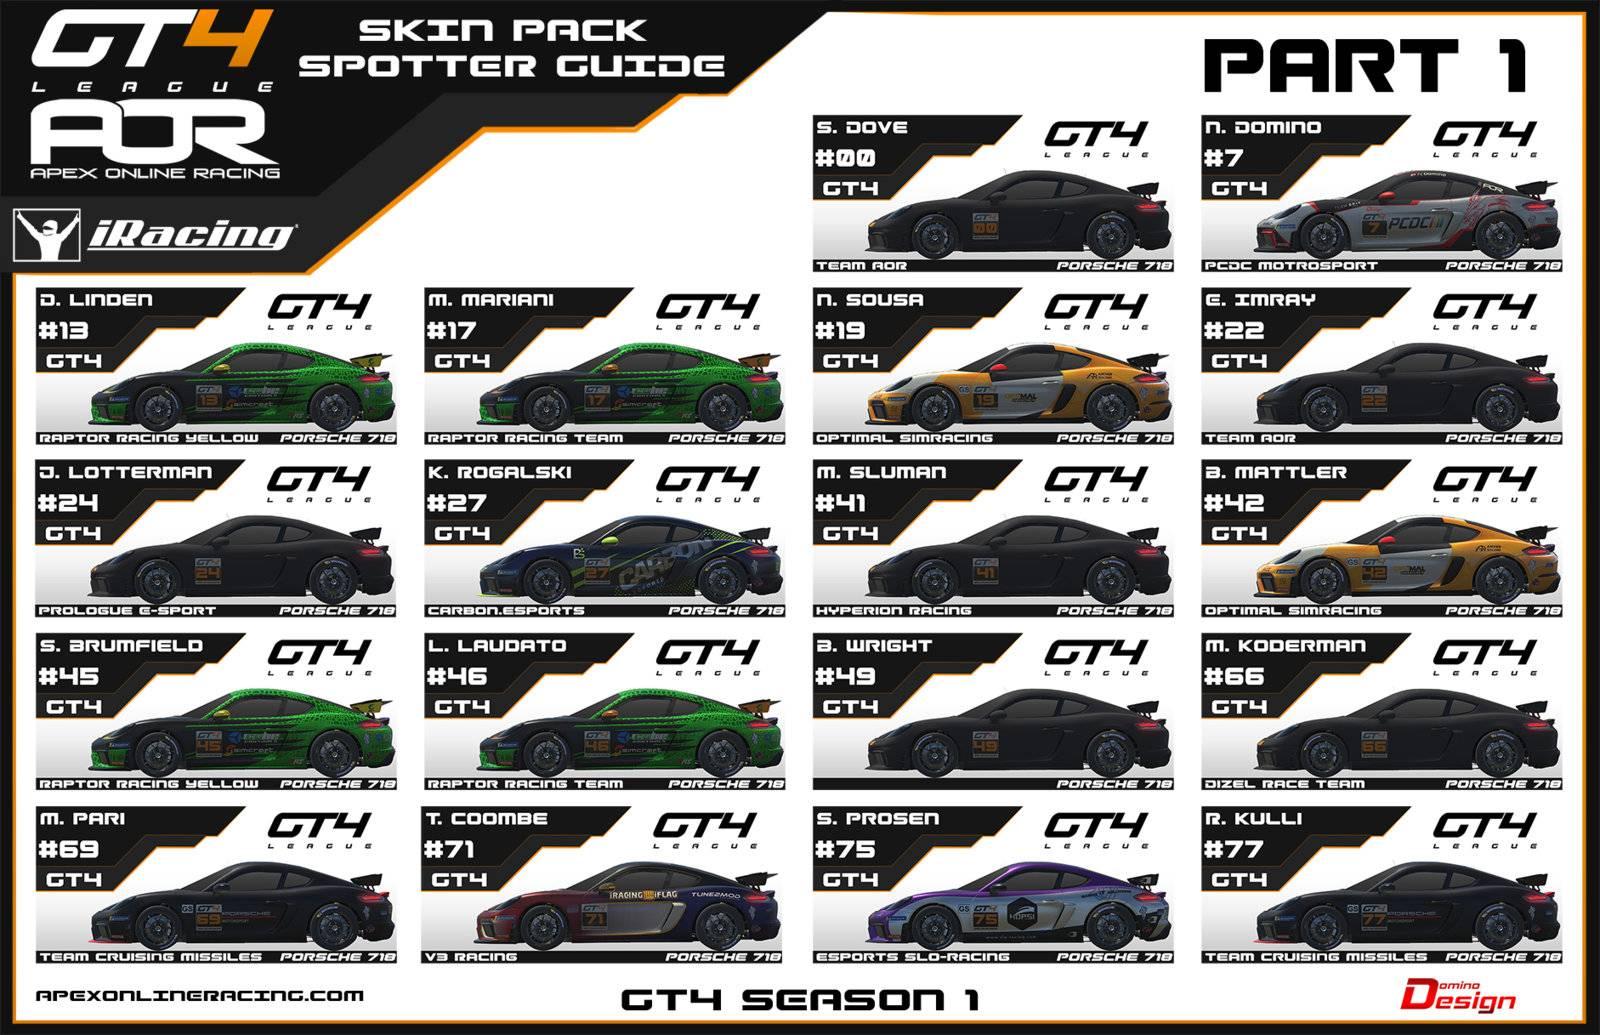 GT4 Spotters Guide Part 1.jpg